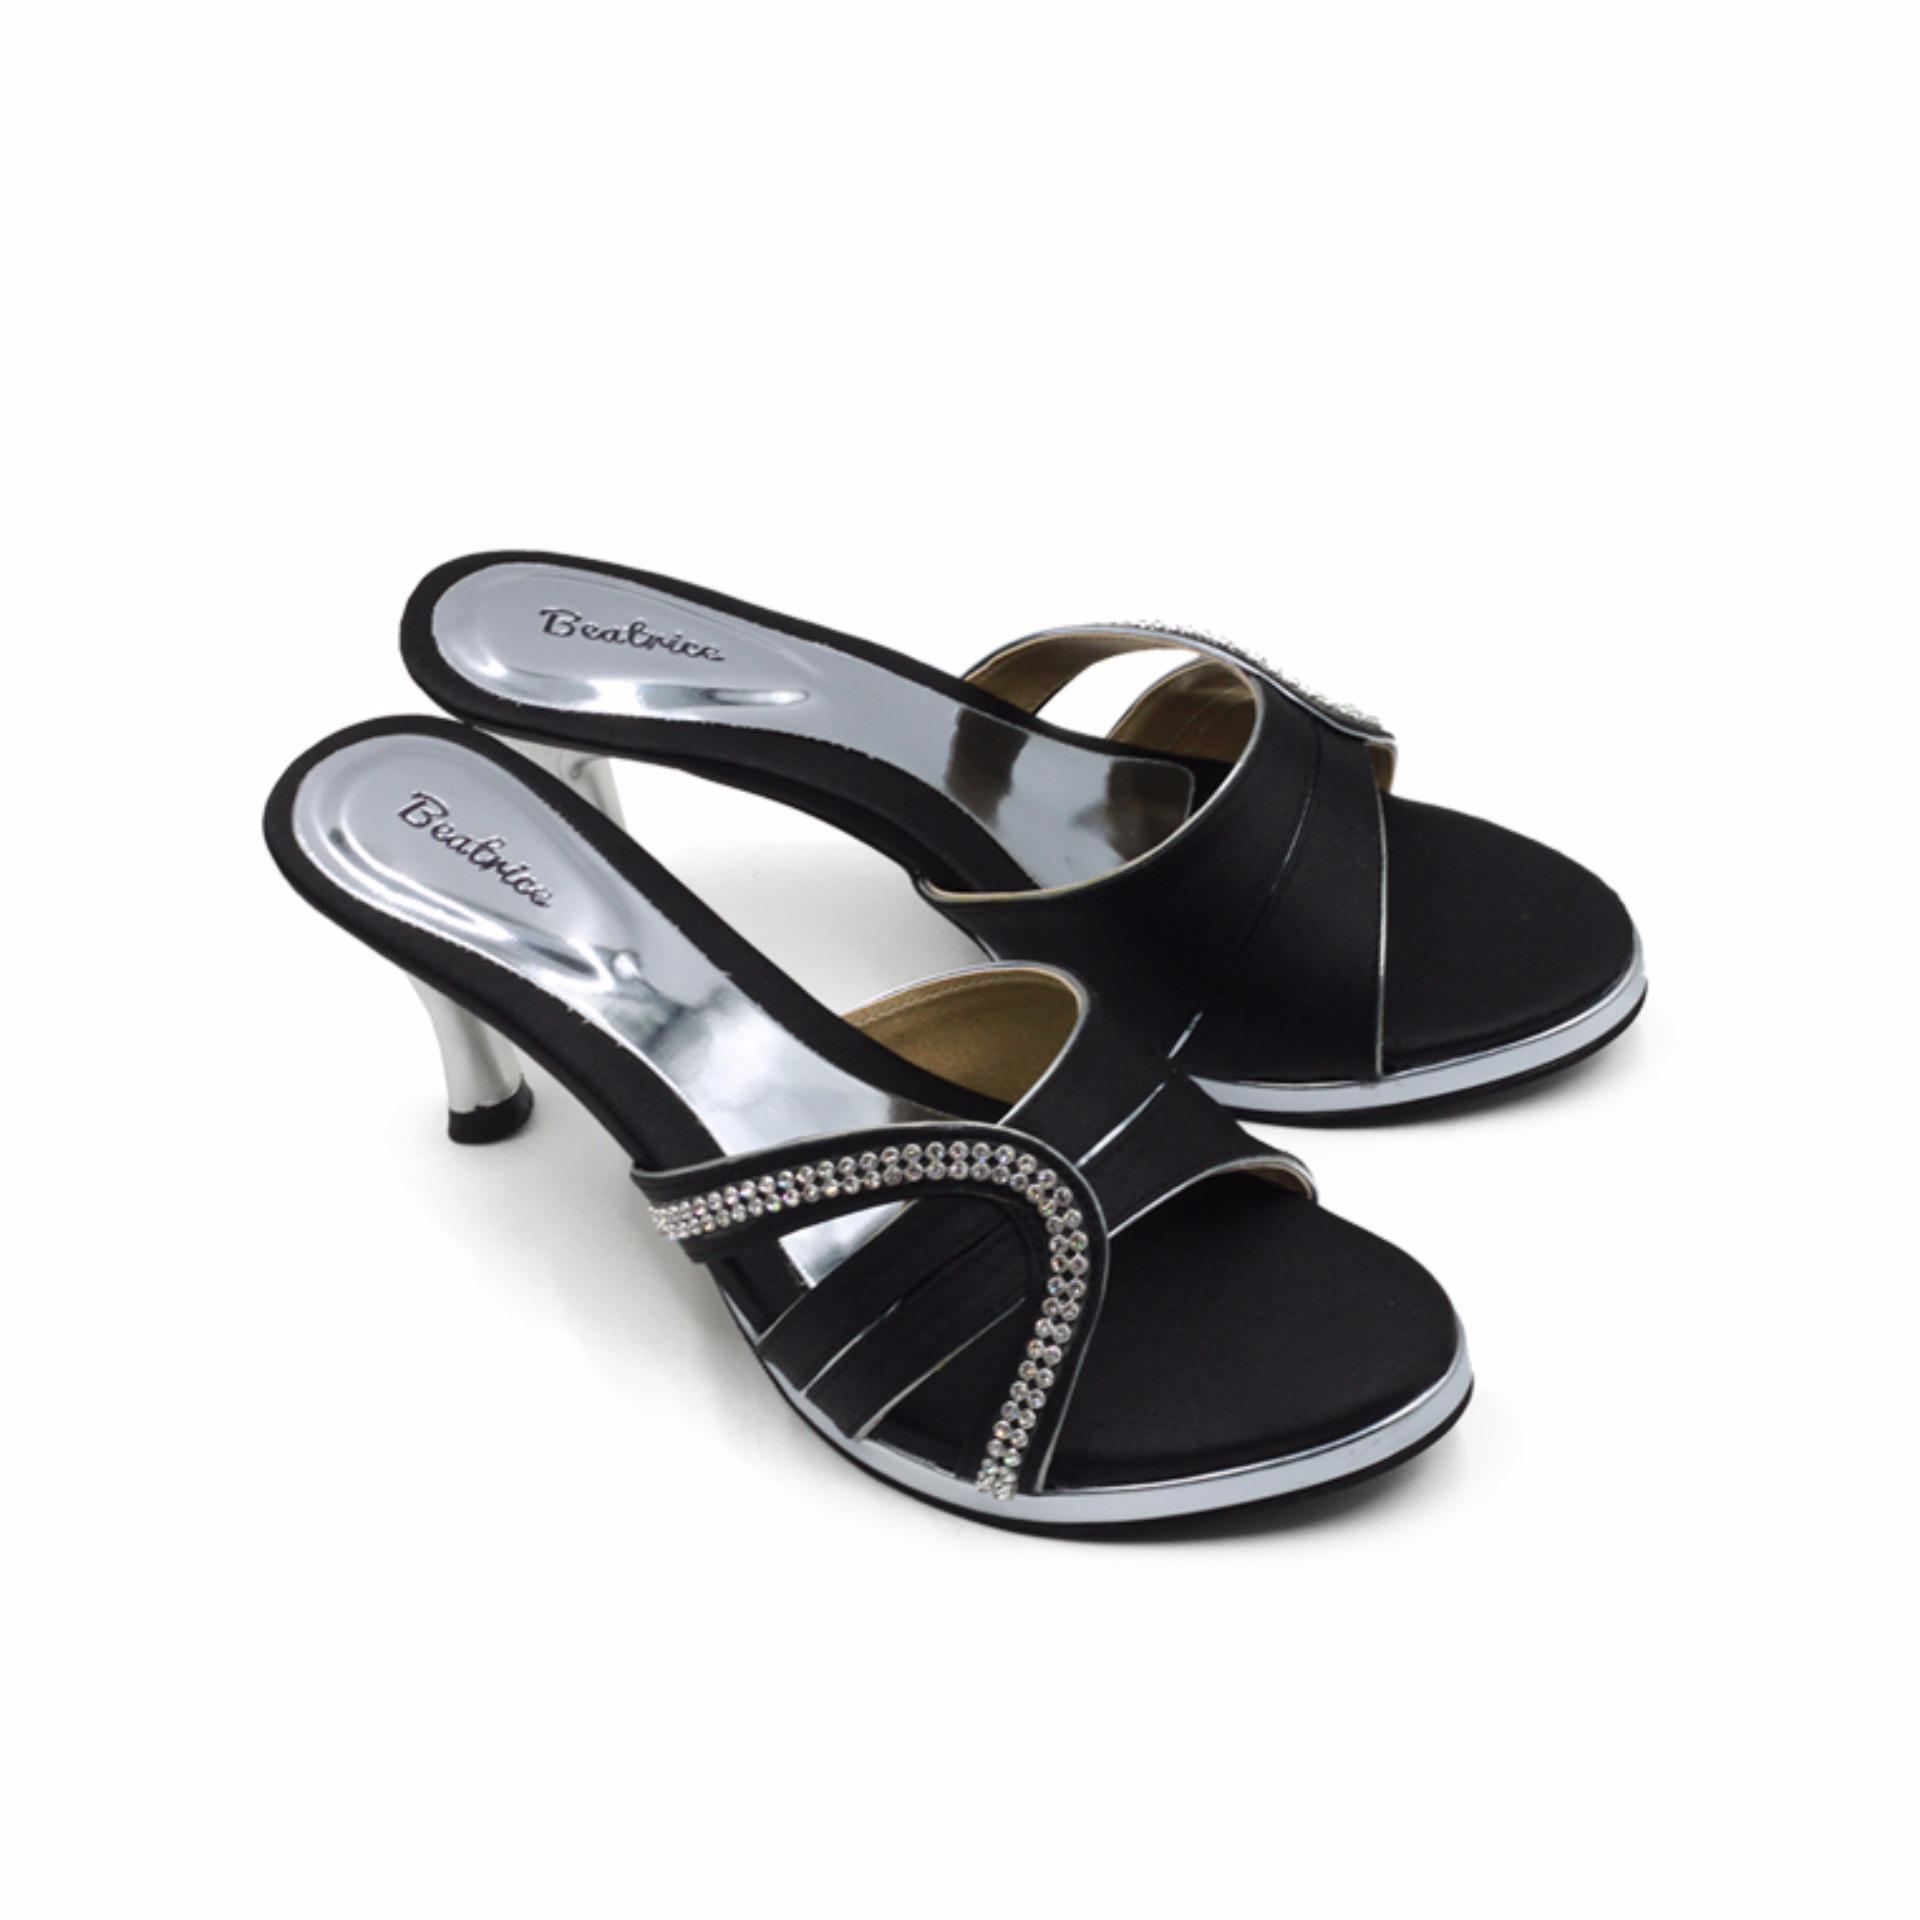 Beatrice Heel Sandals Hak 7 Cm Md 705 Hitam 36 41 Jawa Timur